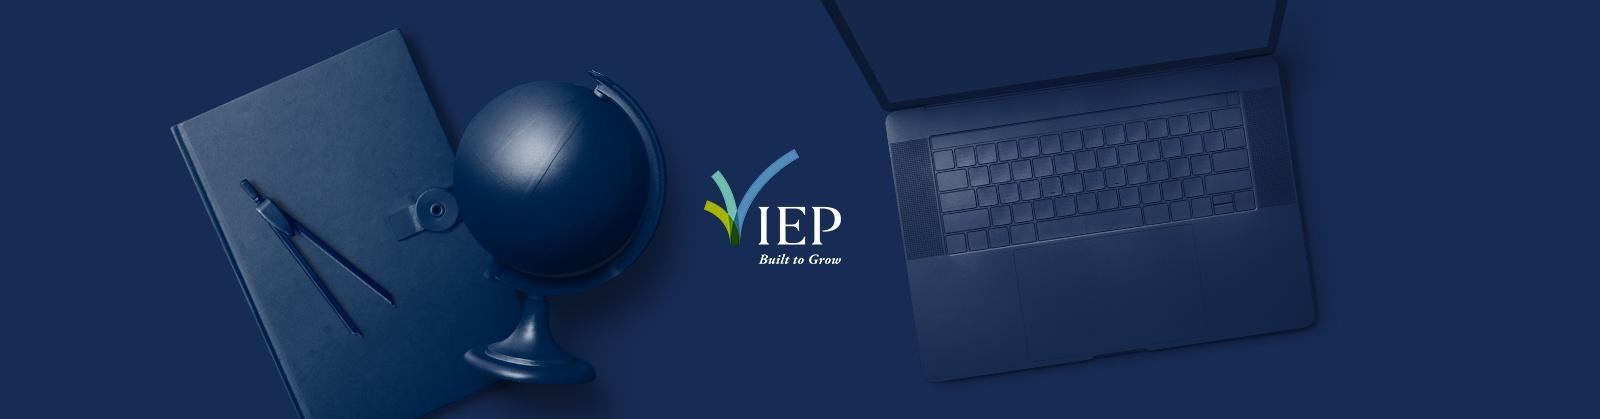 IEP-1.jpg